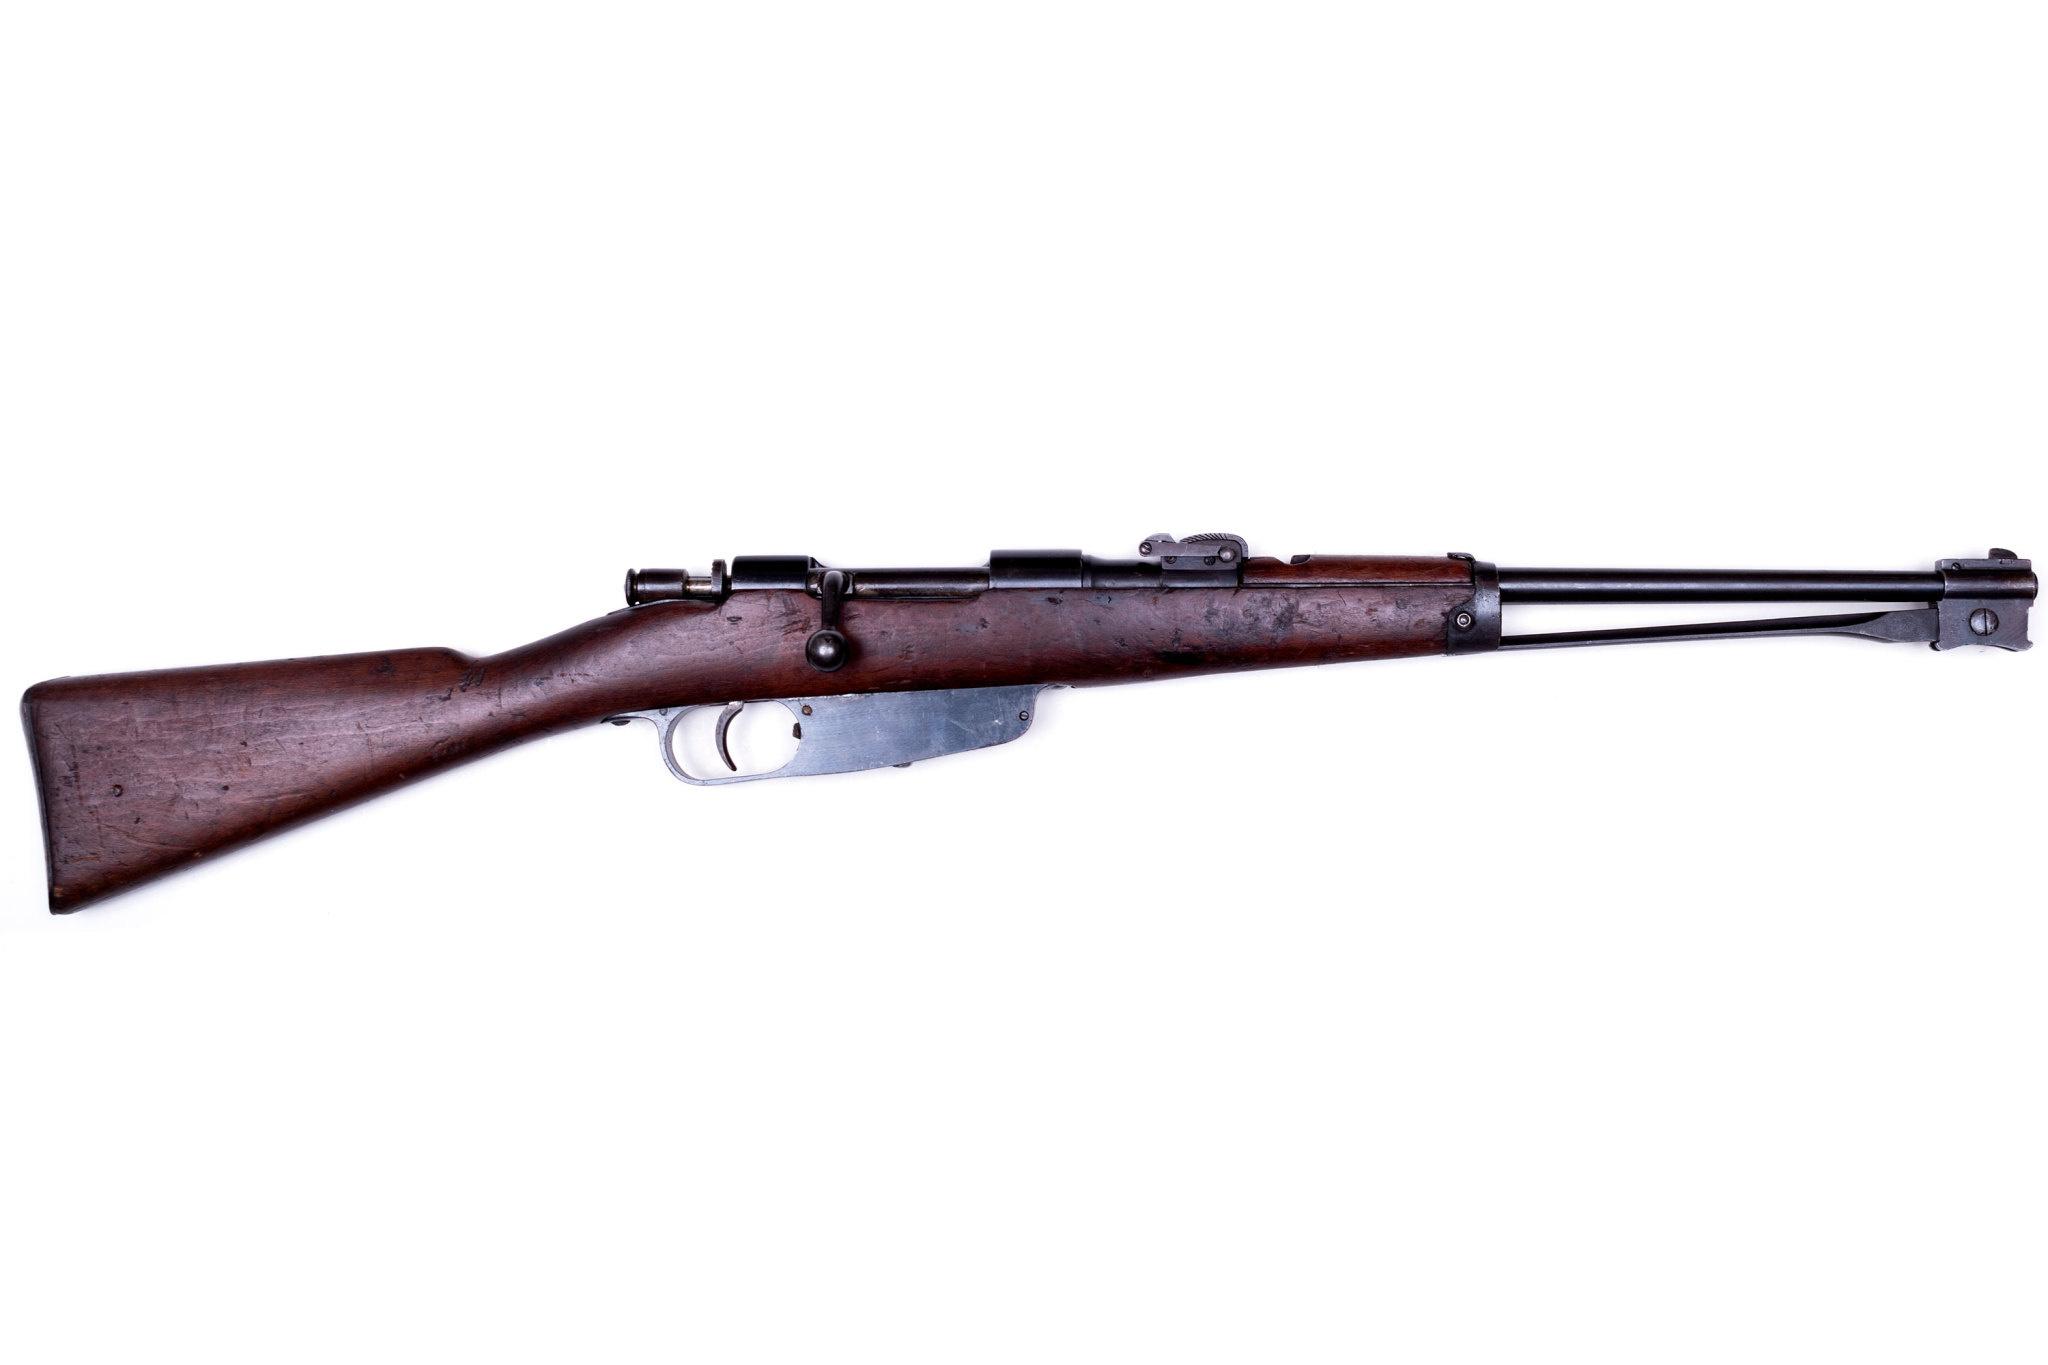 Carcano Surplus Rifle Carcano 6.5x52